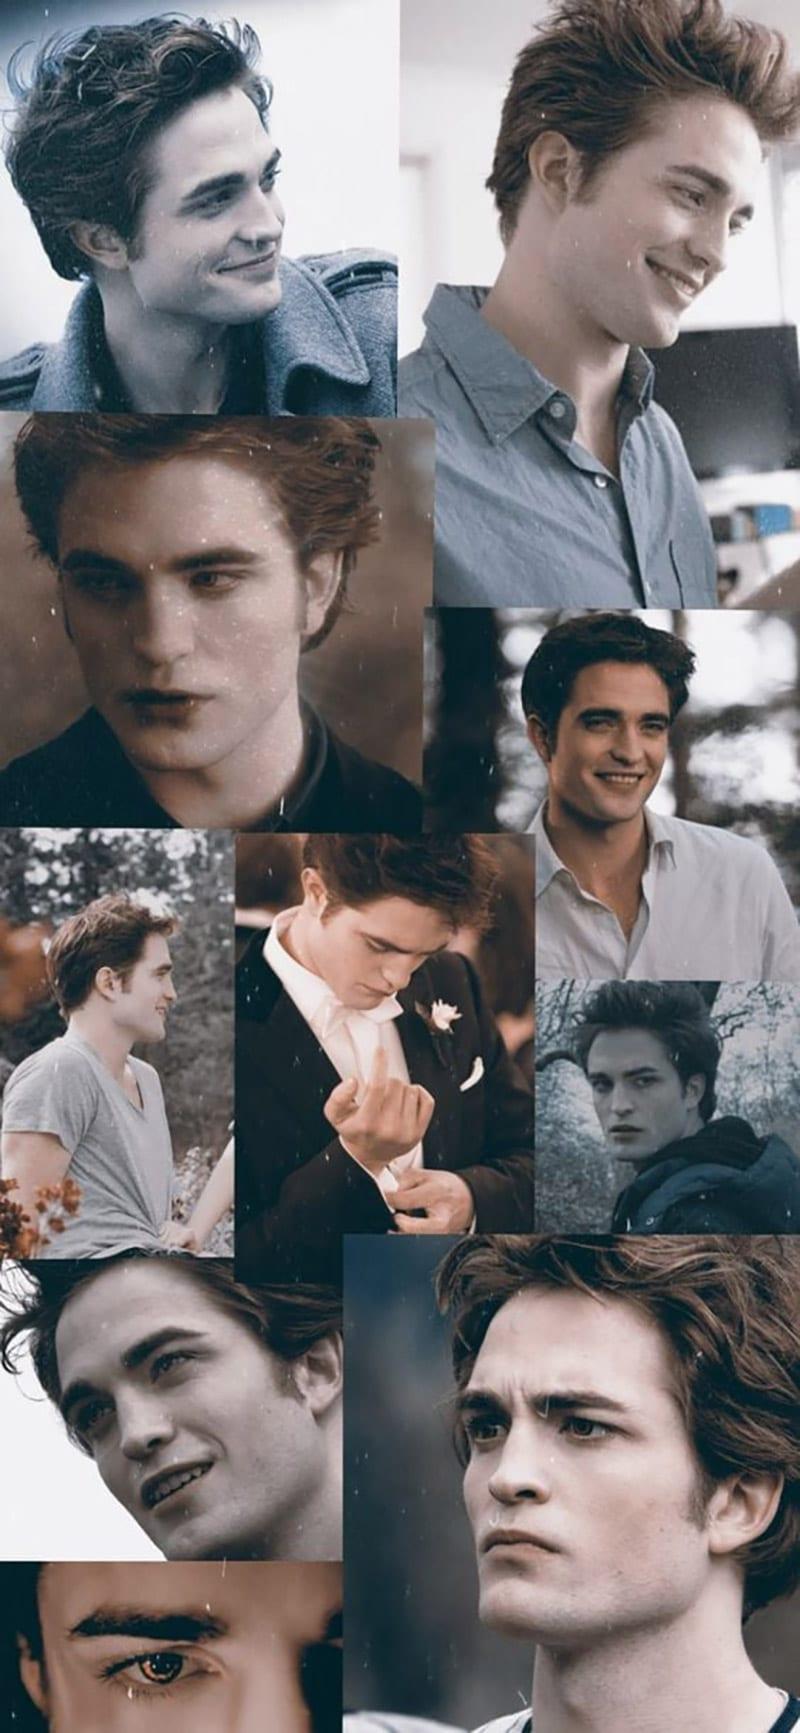 Edward Cullen (Robert Pattinson) - The Twilight Saga